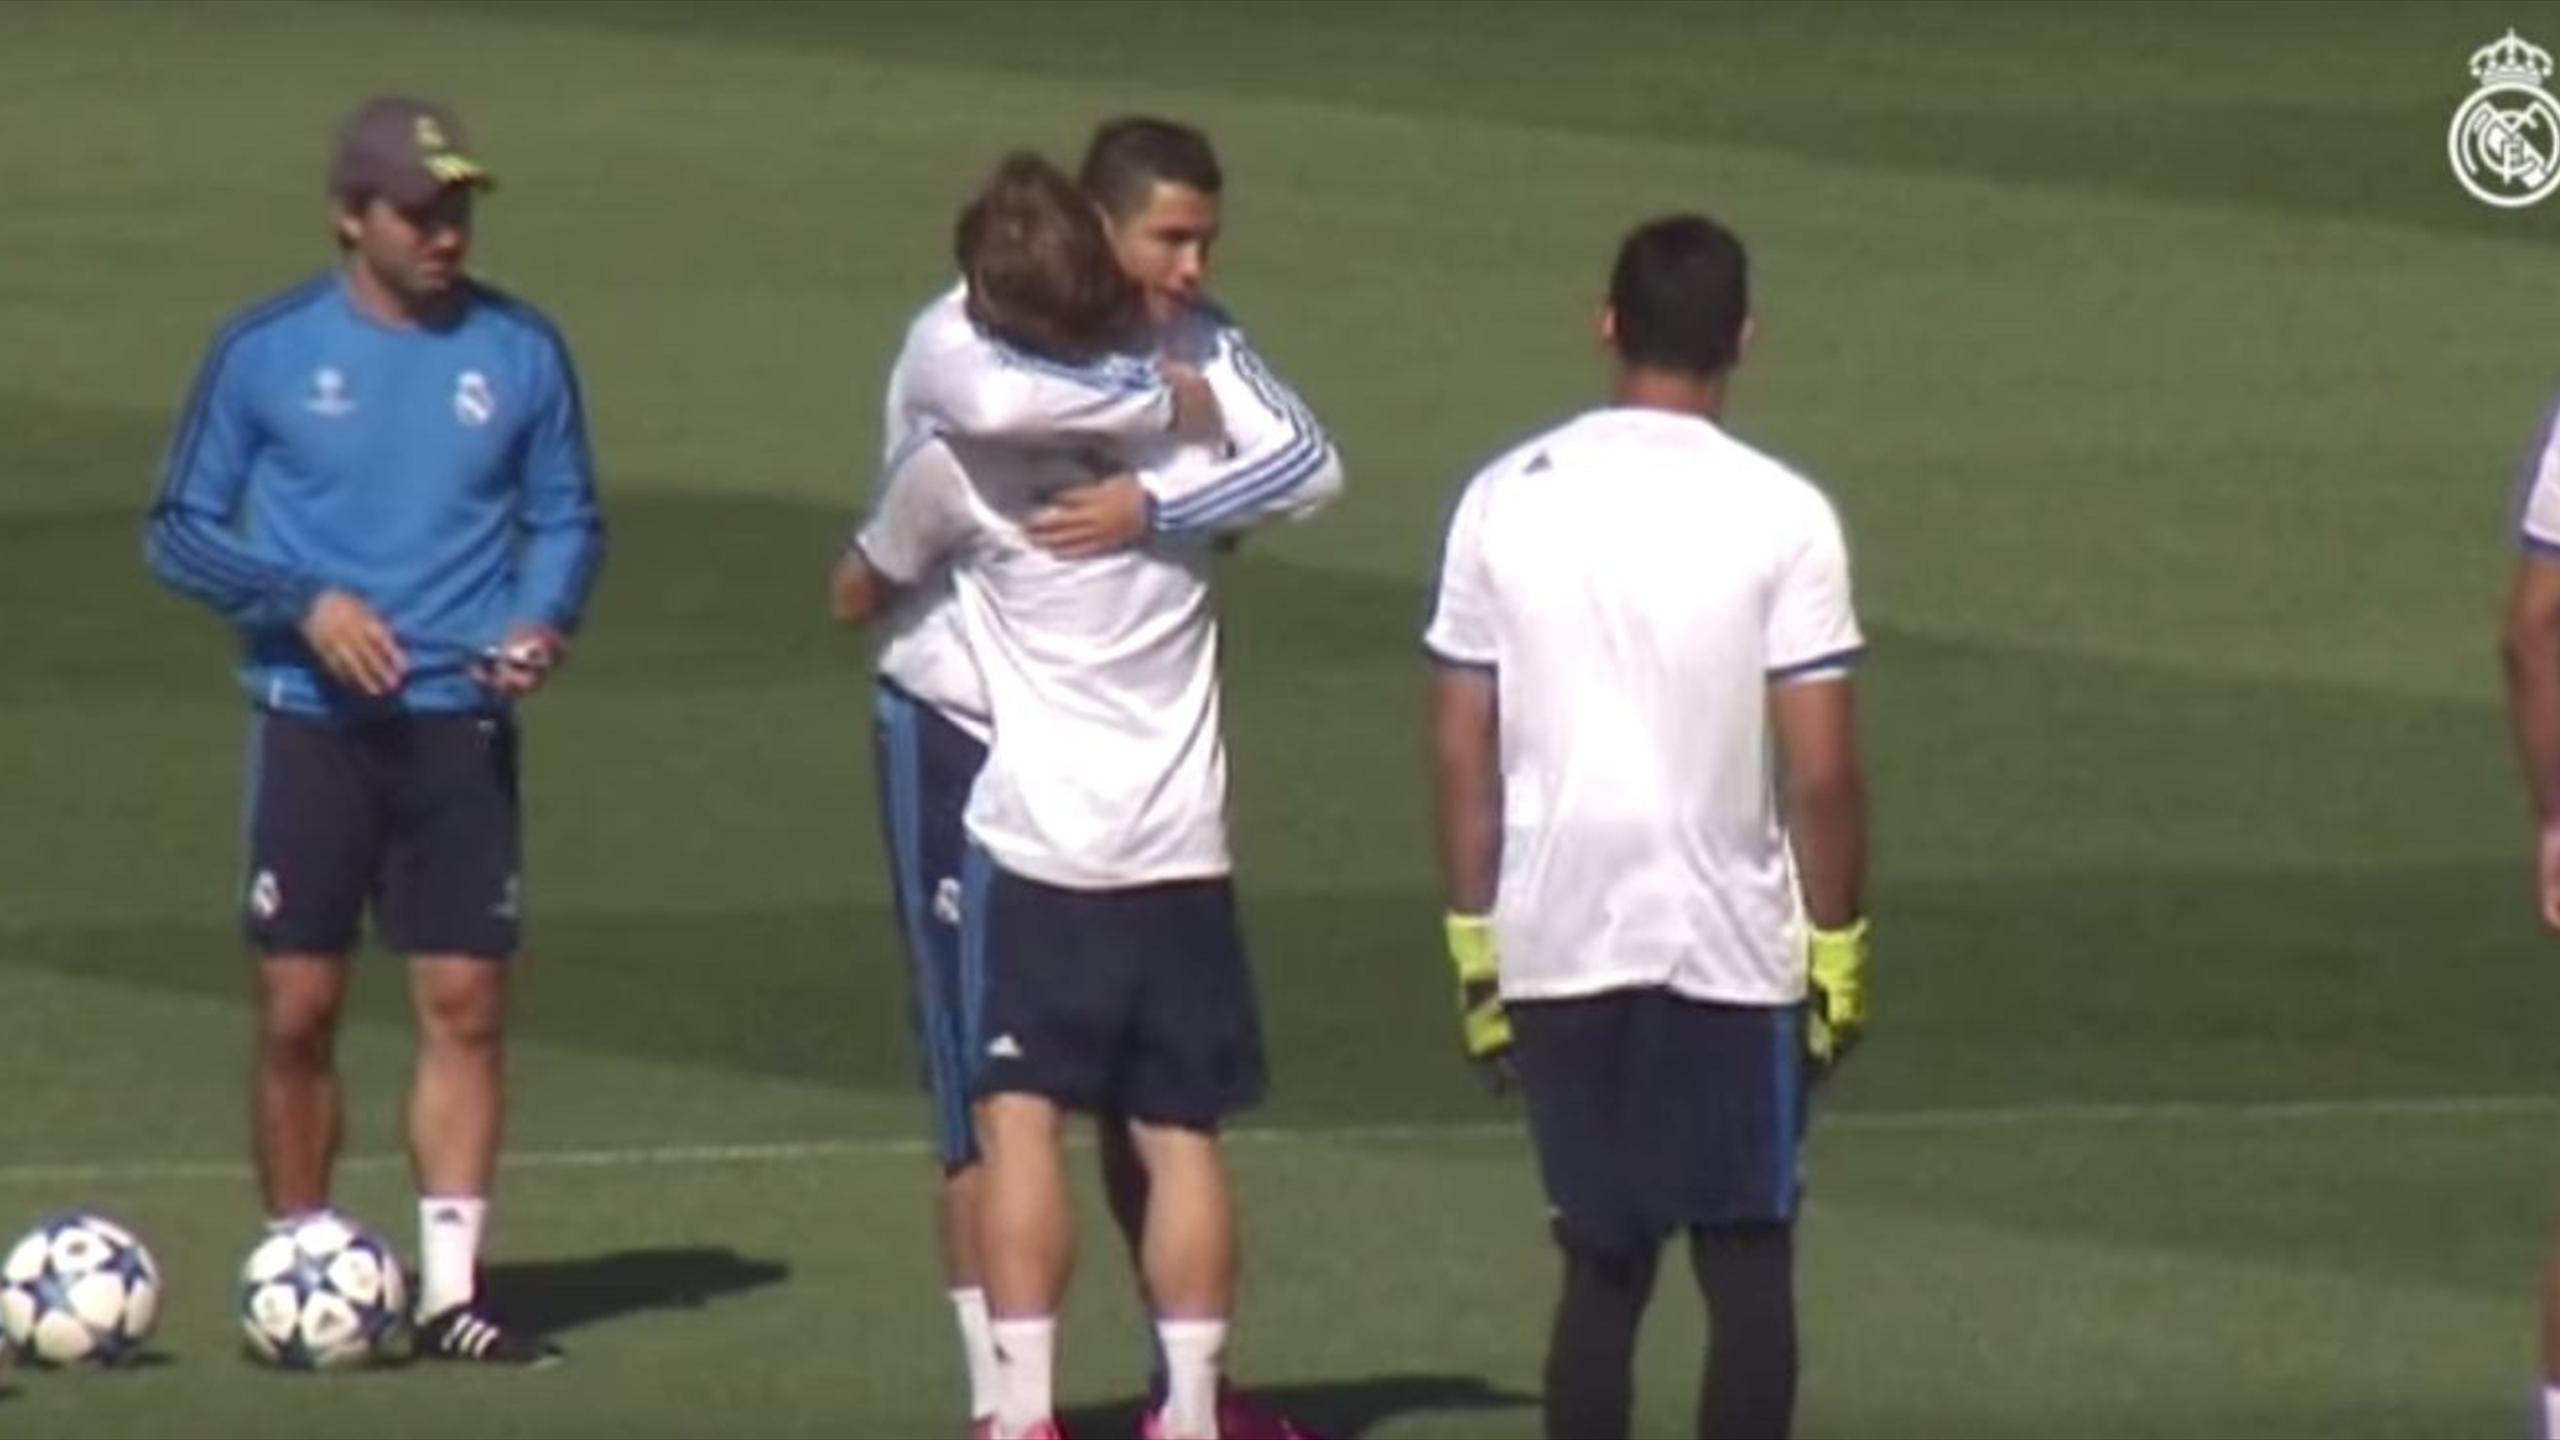 Cristiano Ronaldo hugged by Luka Modric during Real Madrid training.